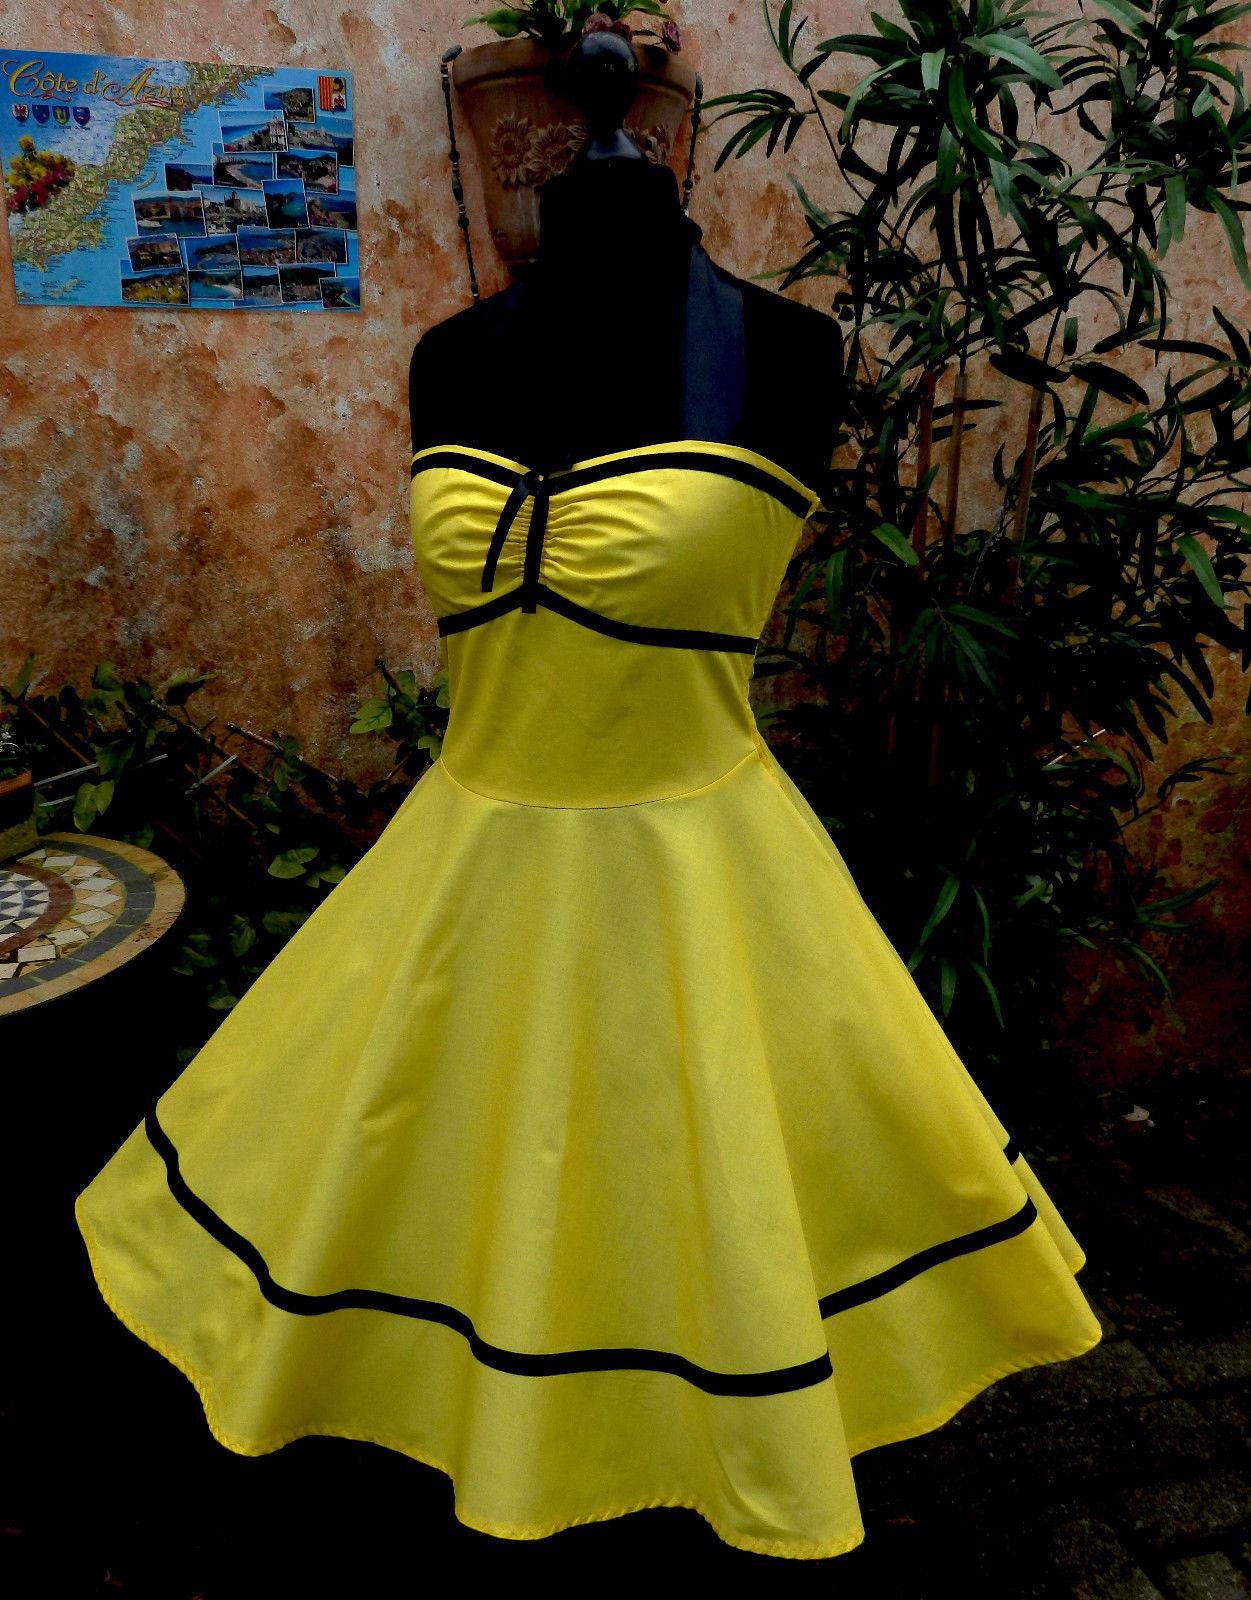 Designer Top Abend Petticoat Kleid Vertrieb17 Coolste Abend Petticoat Kleid Galerie